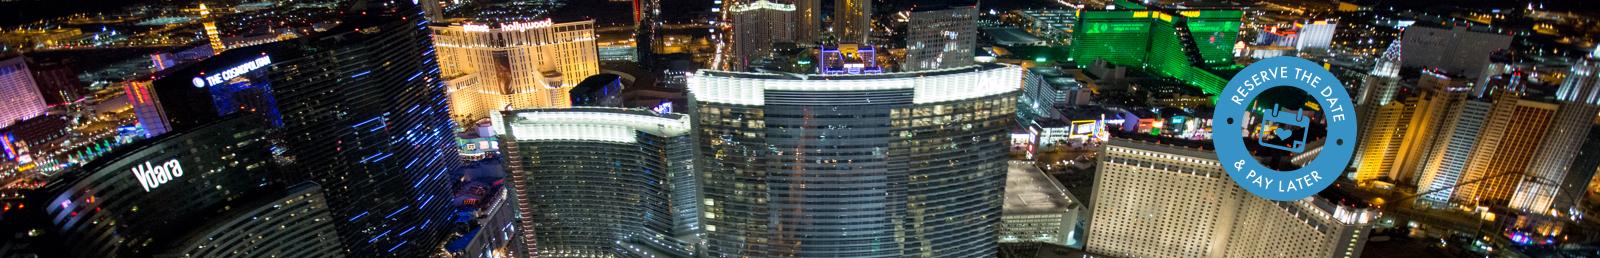 Las Vegas Night Strip Helicopter Flight Wedding Ceremony Package